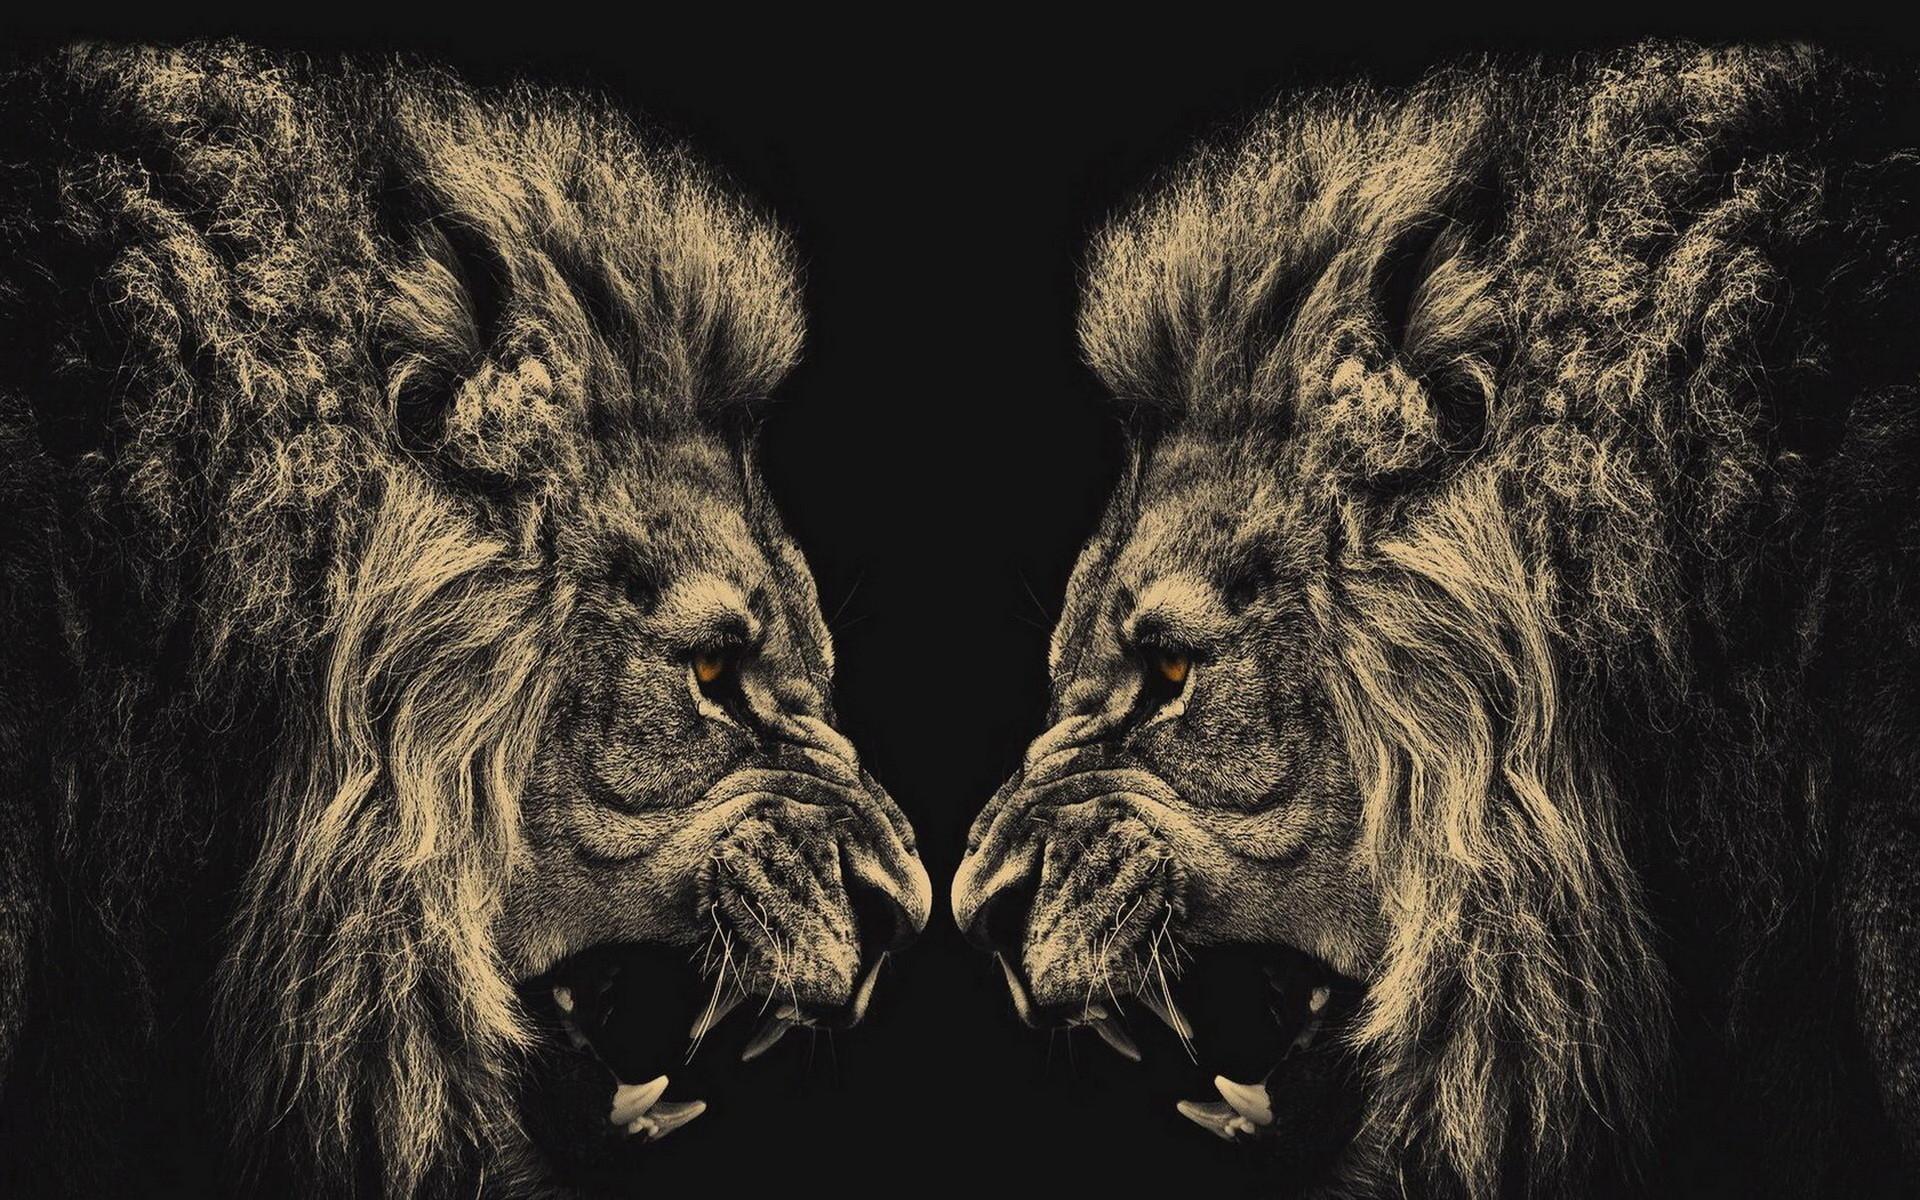 Lion Hd Wallpaper Download Wallpaper Desktop Hd